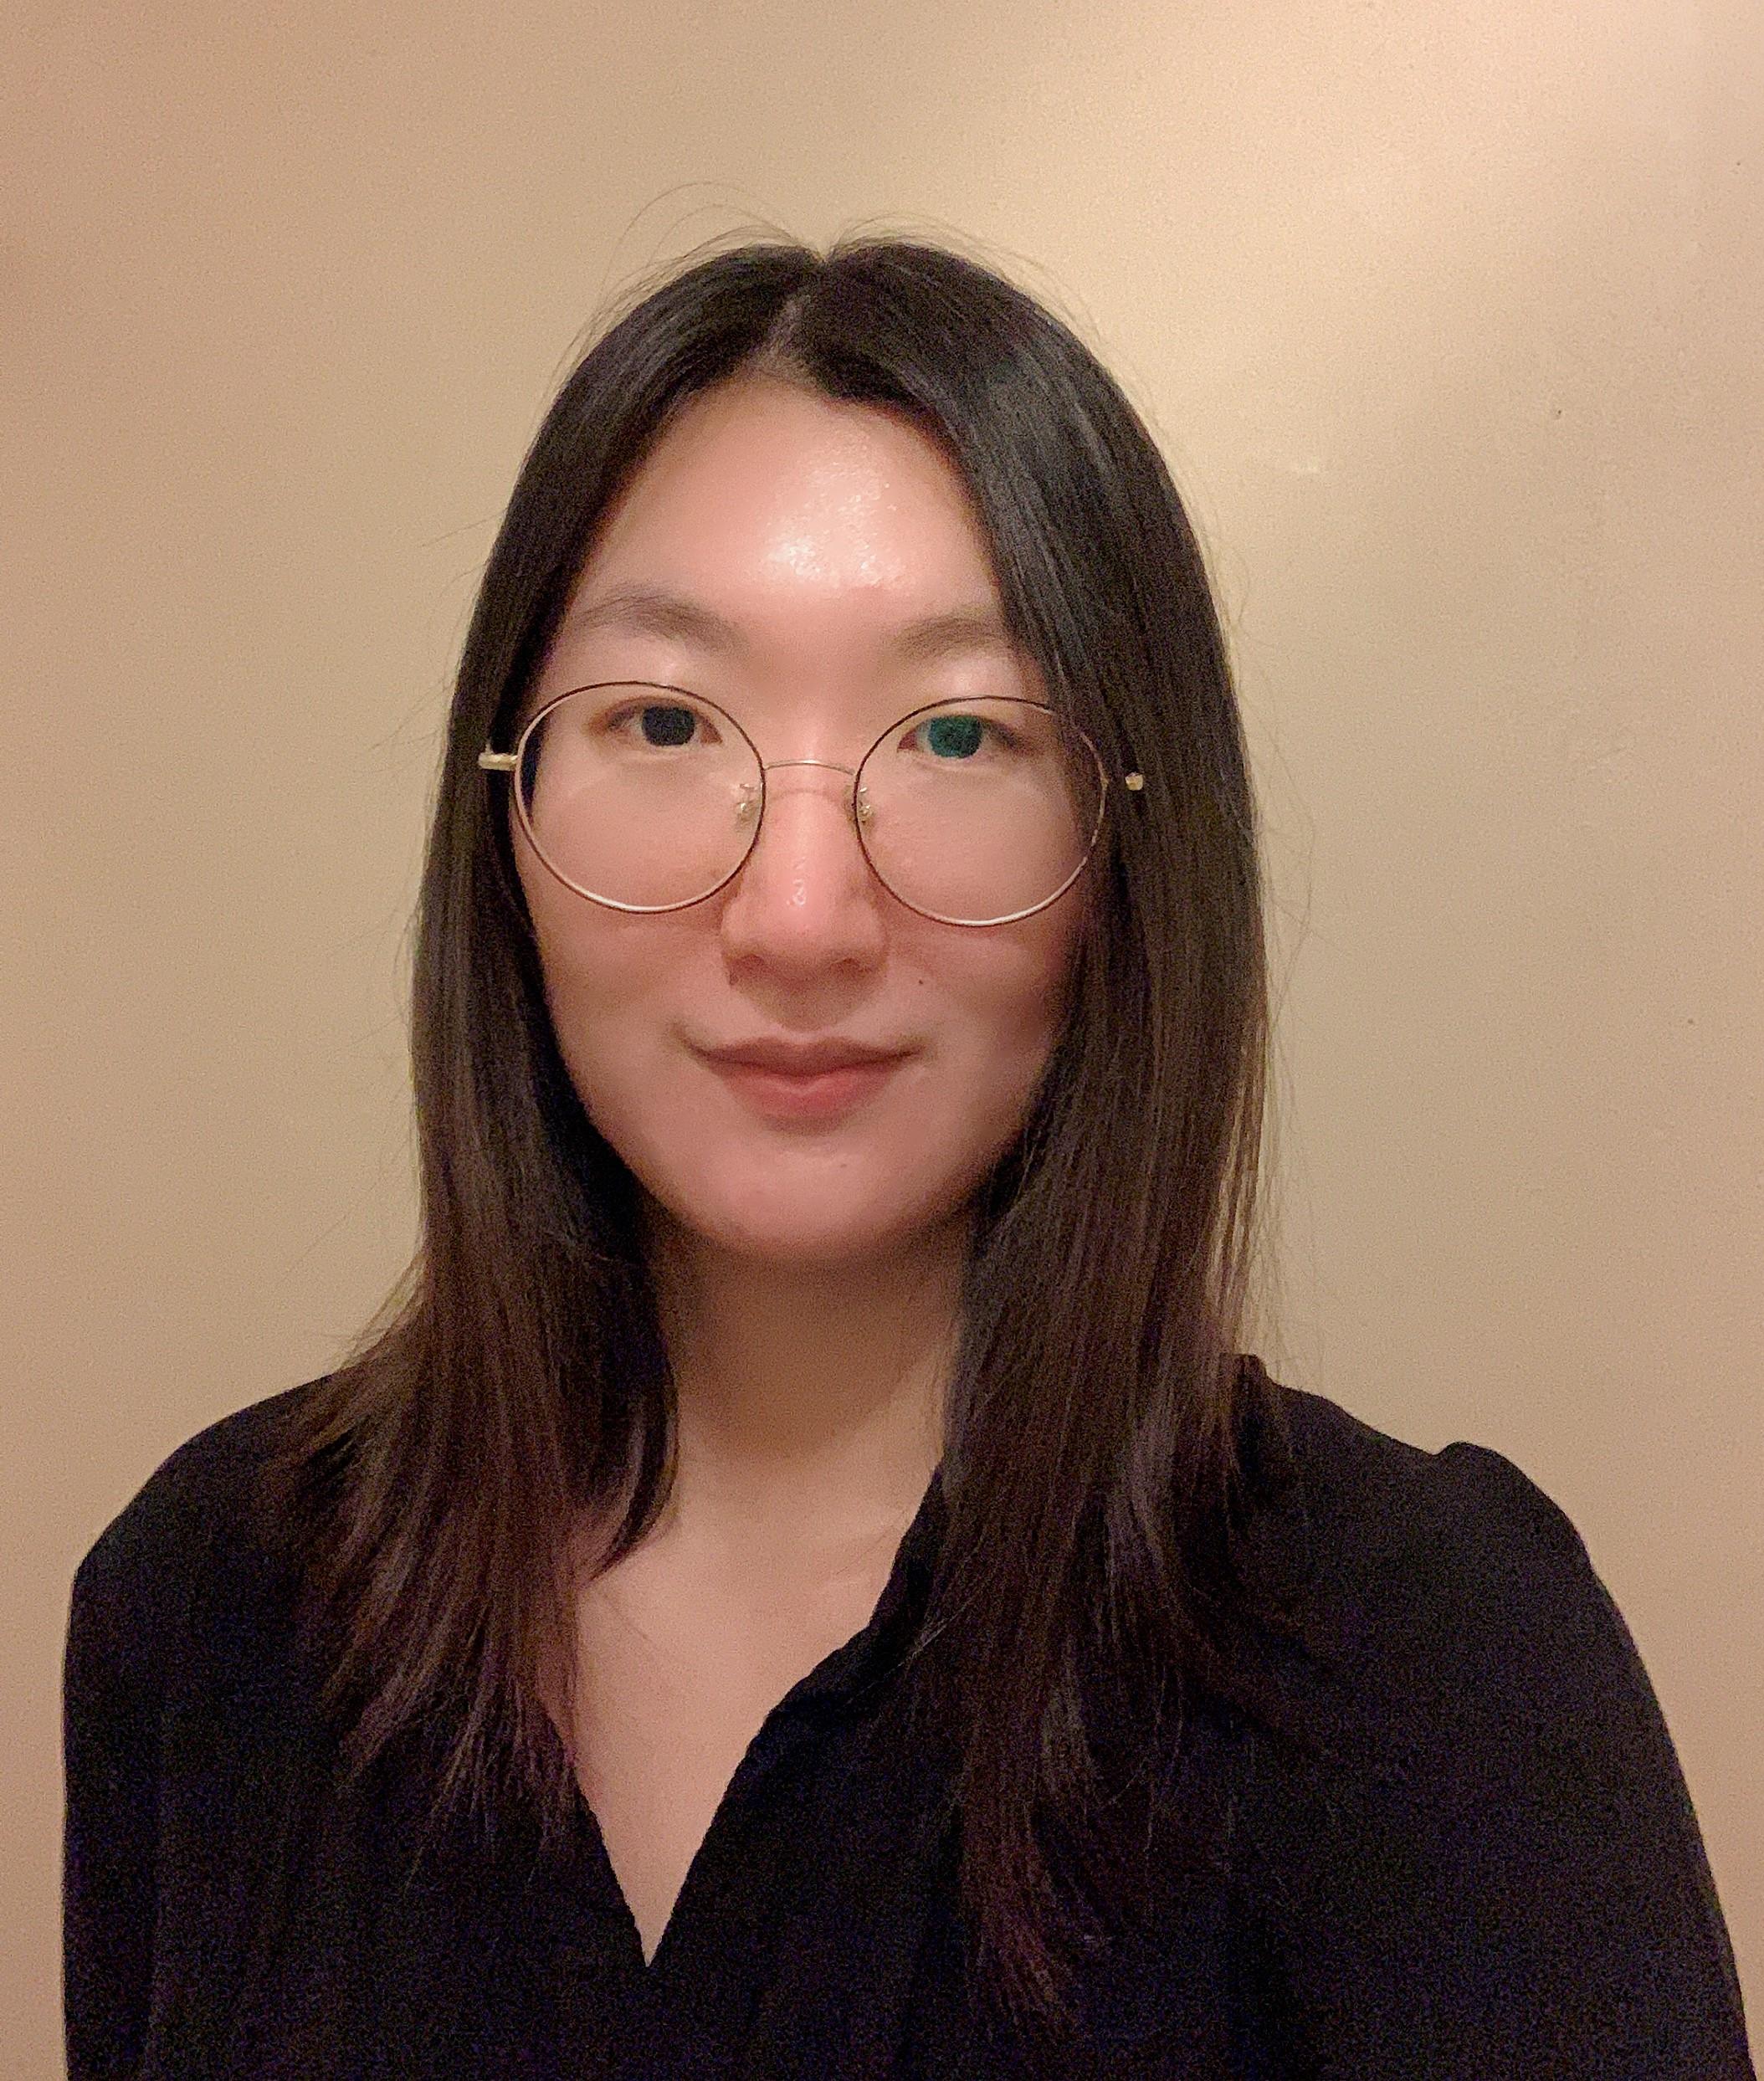 Qijia Zang Headshot